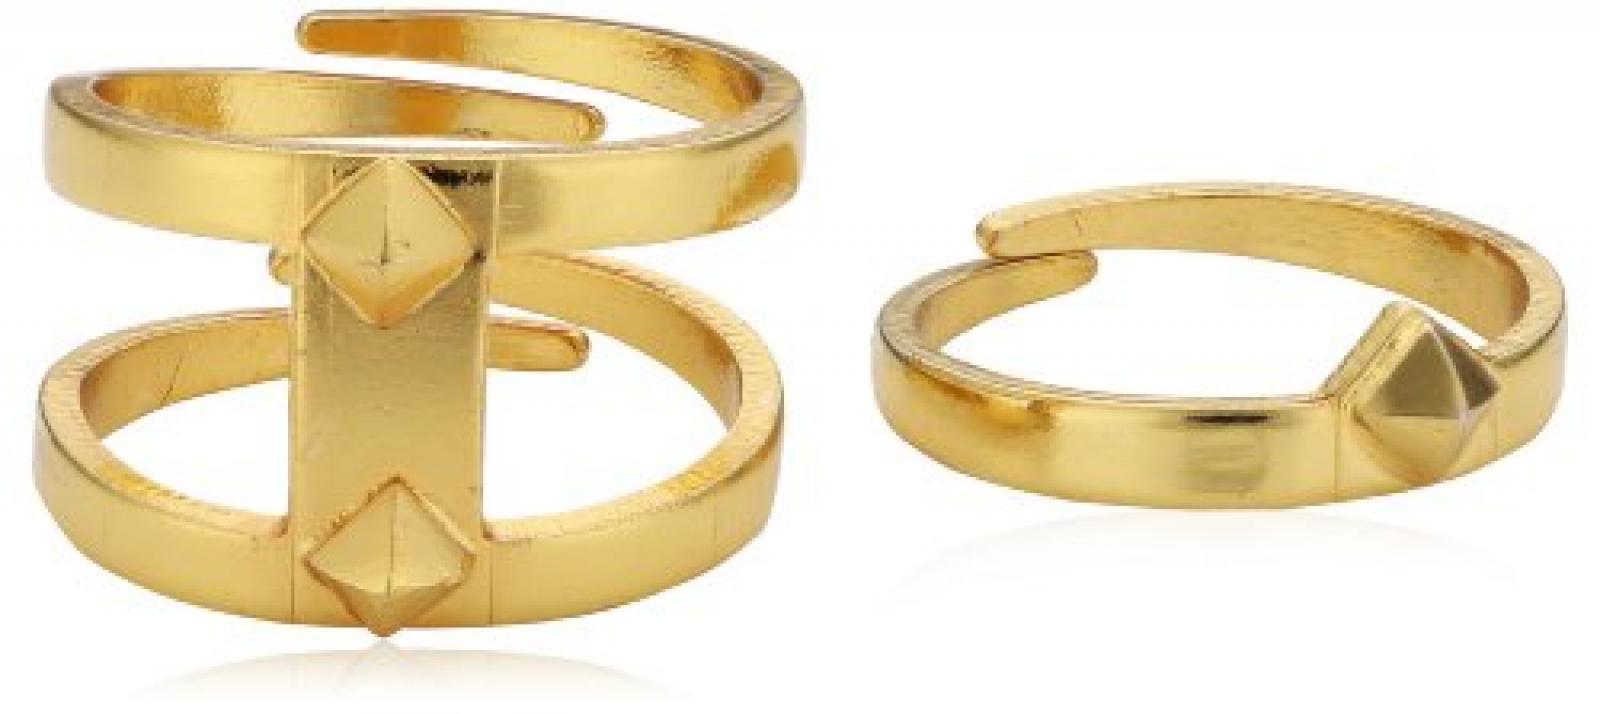 Pilgrim Jewelry Damen Ring Messing Tiny Rivet 1.3 cm 121422004